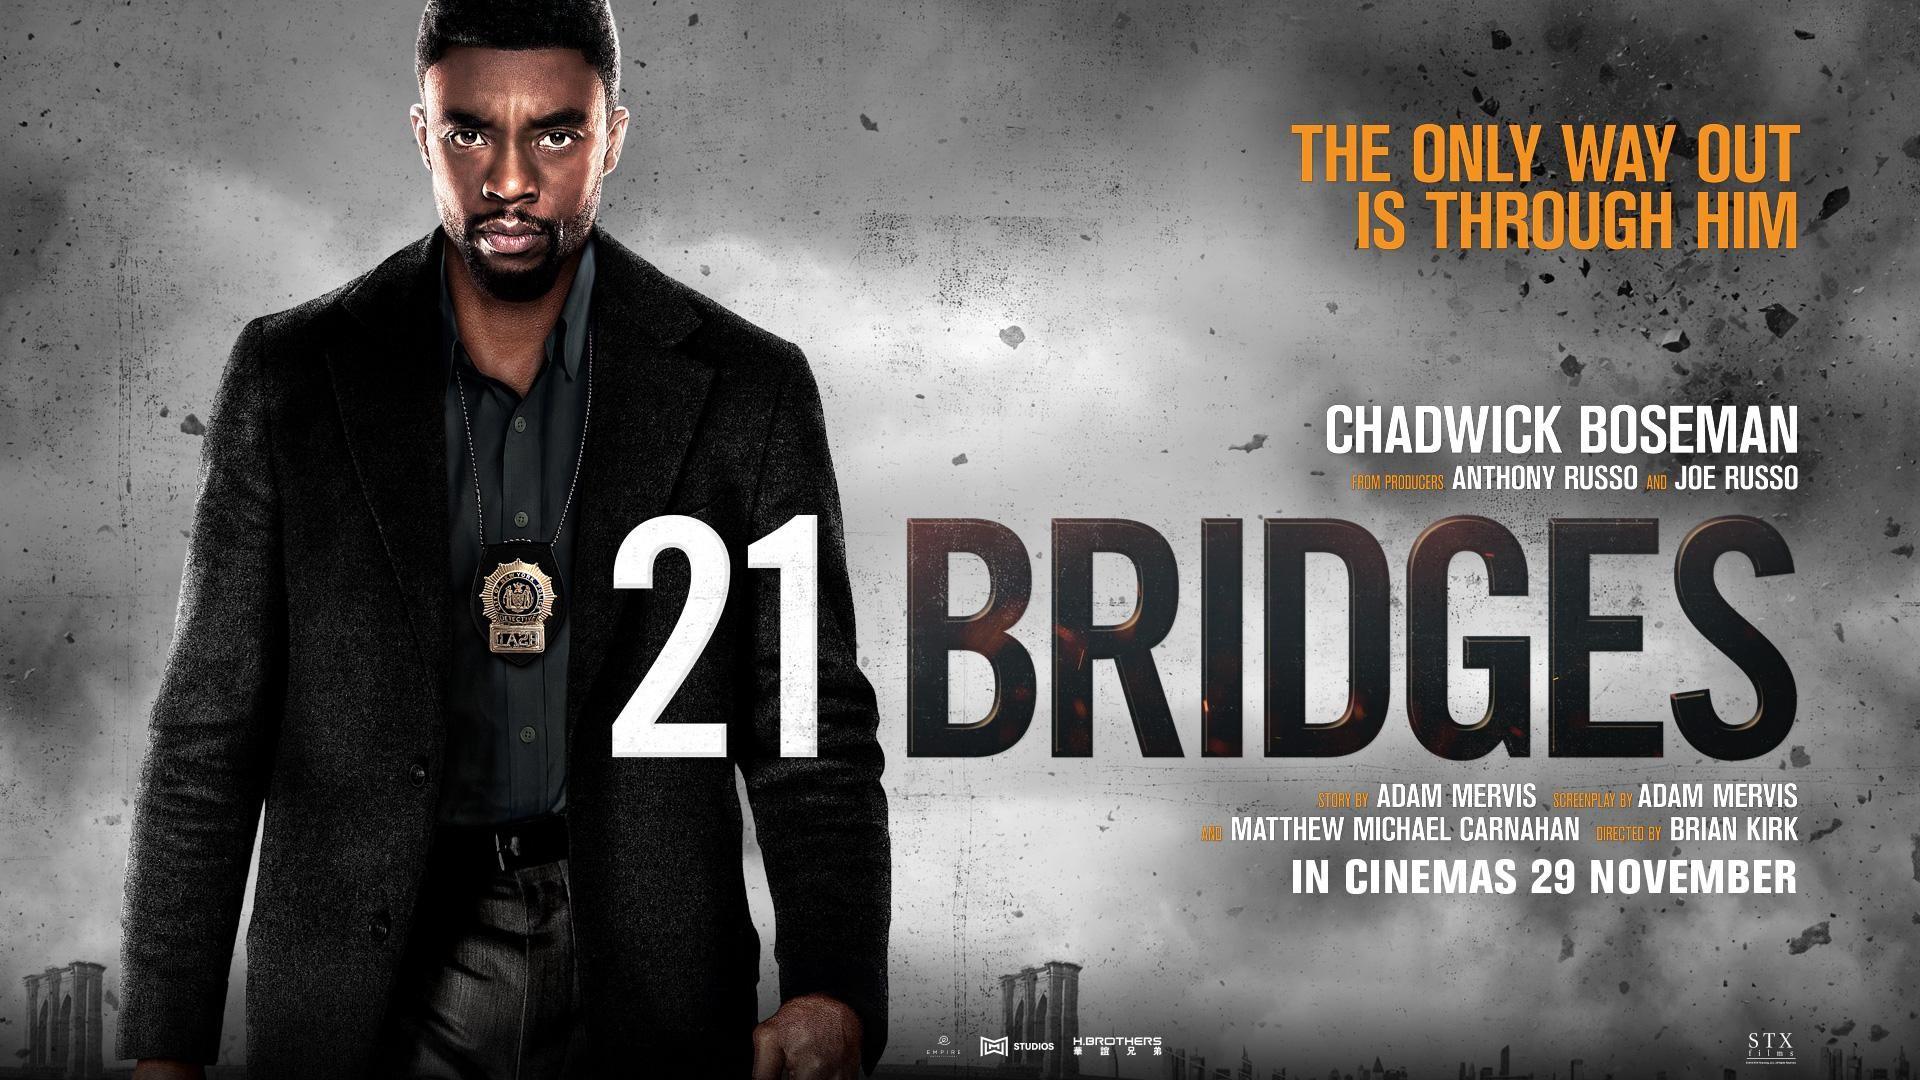 21 Bridges Joe Russo Taylor Kitsch Chadwick Boseman